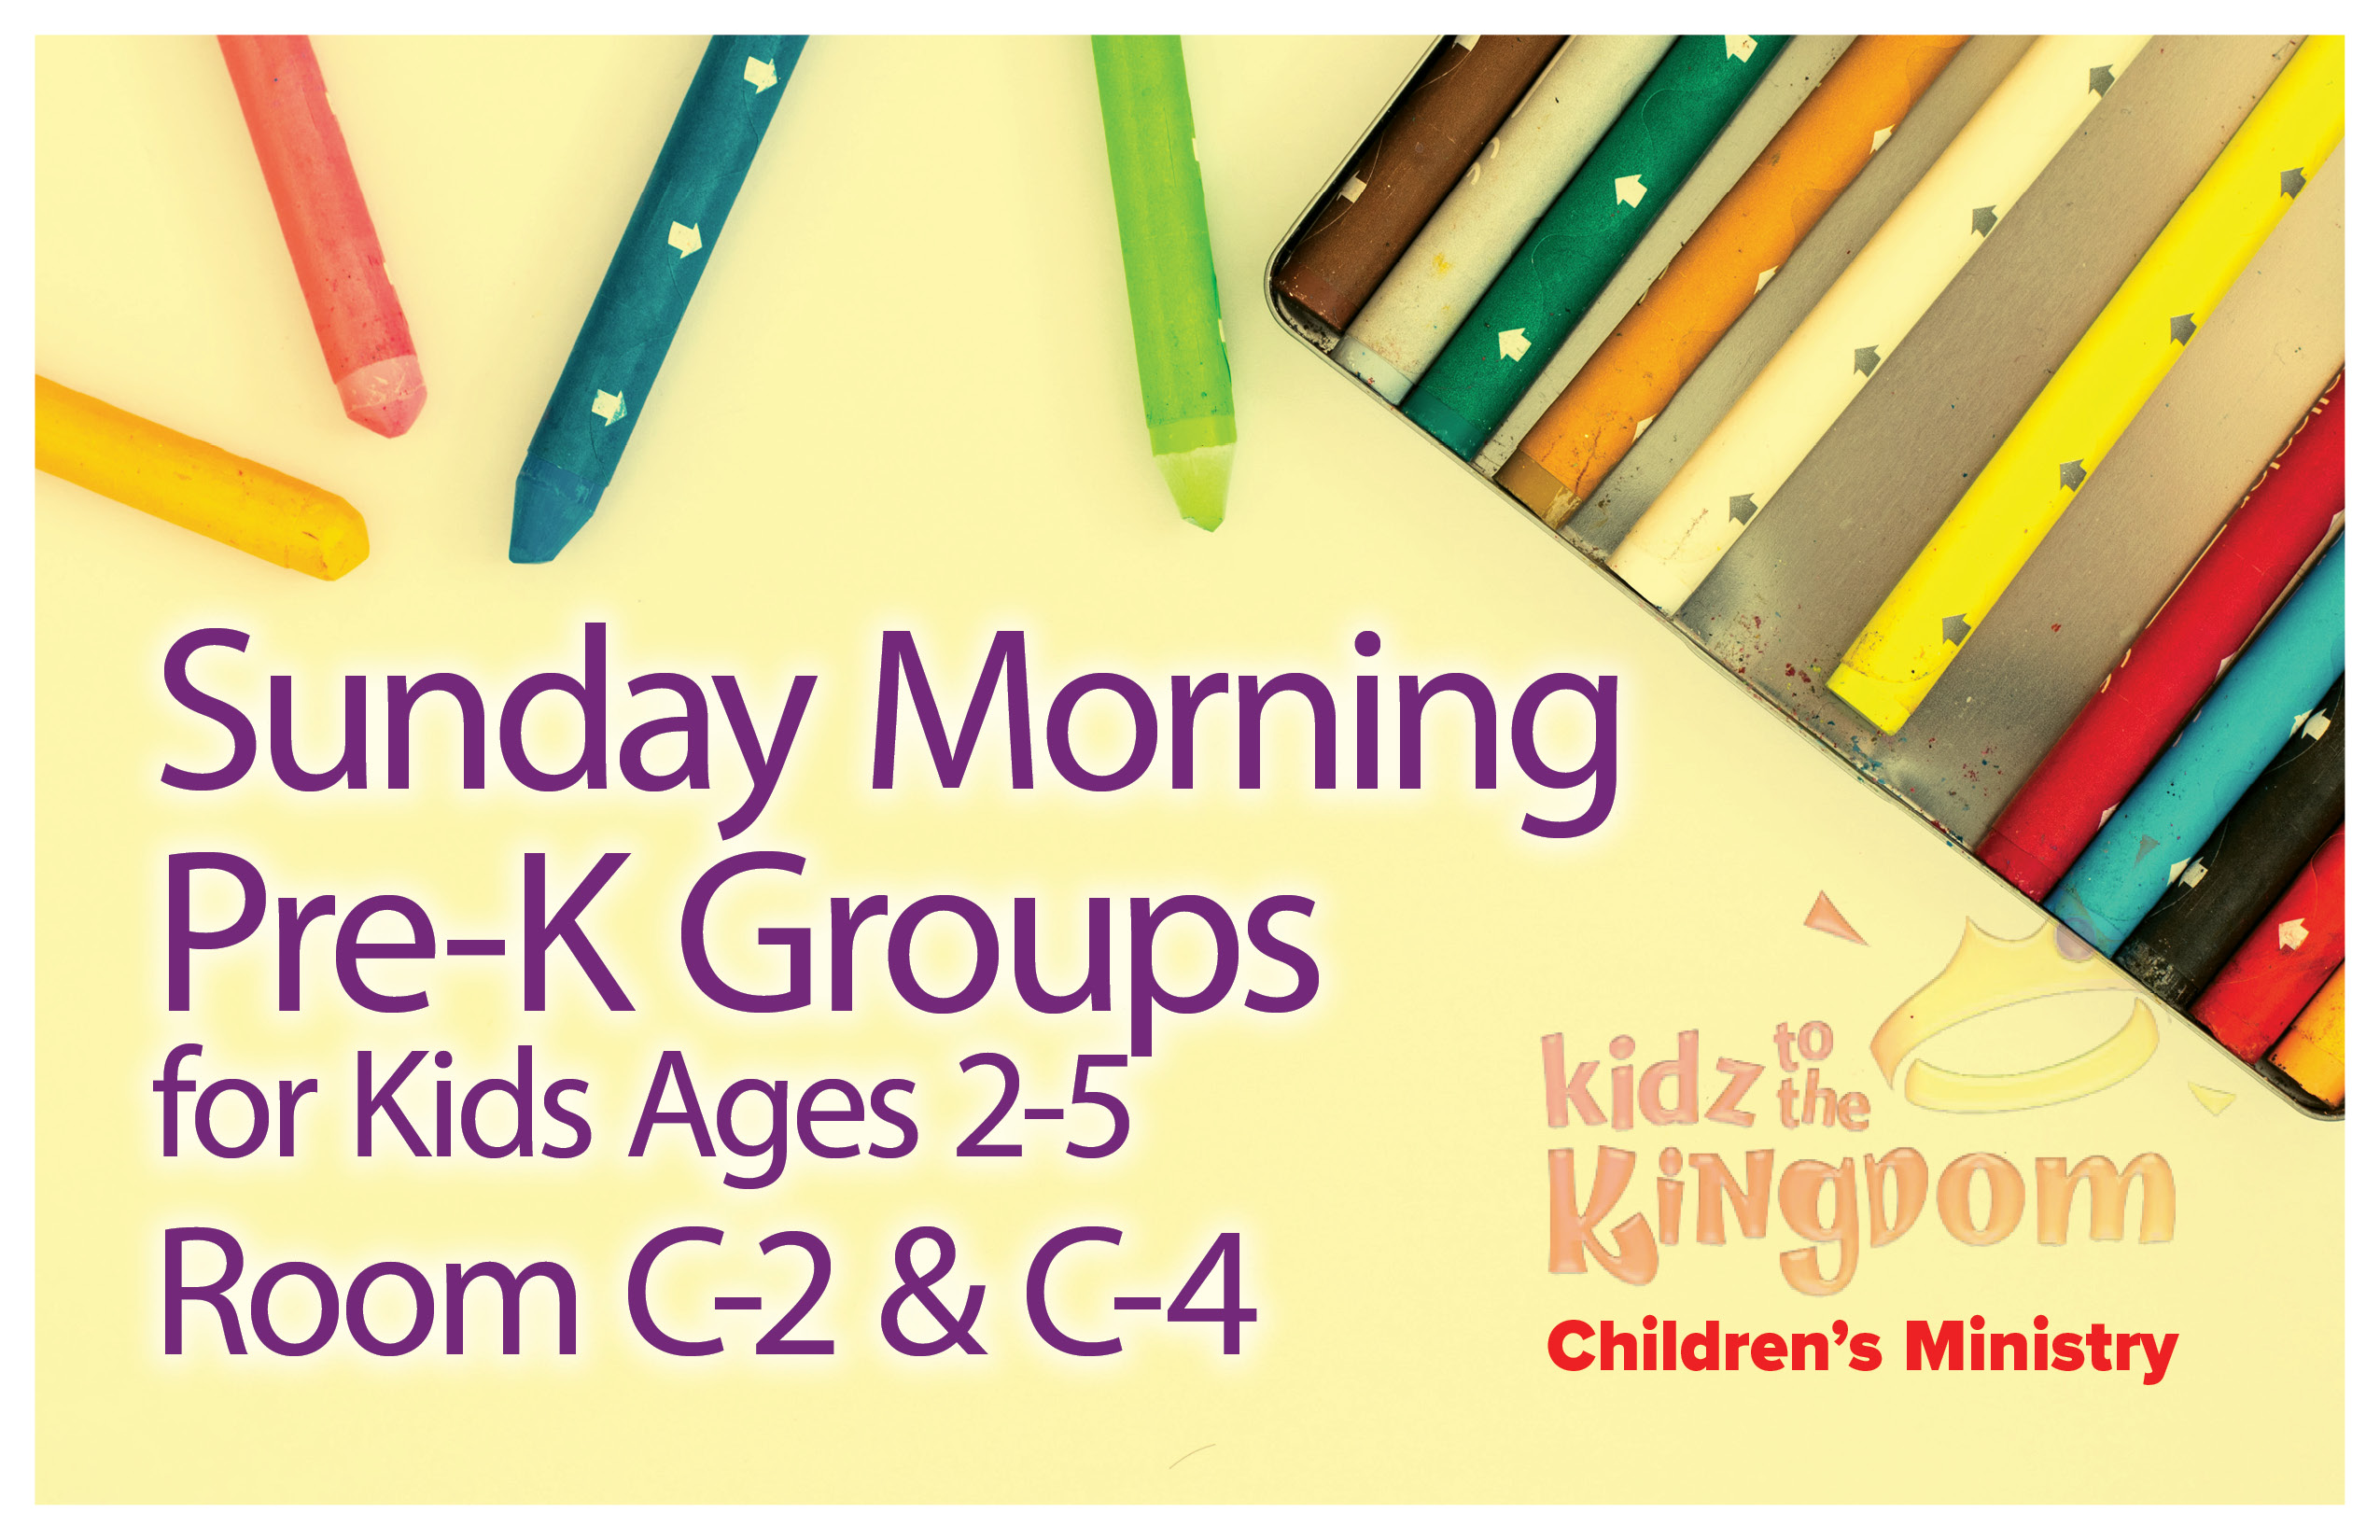 Sunday Morning Pre-K Groups